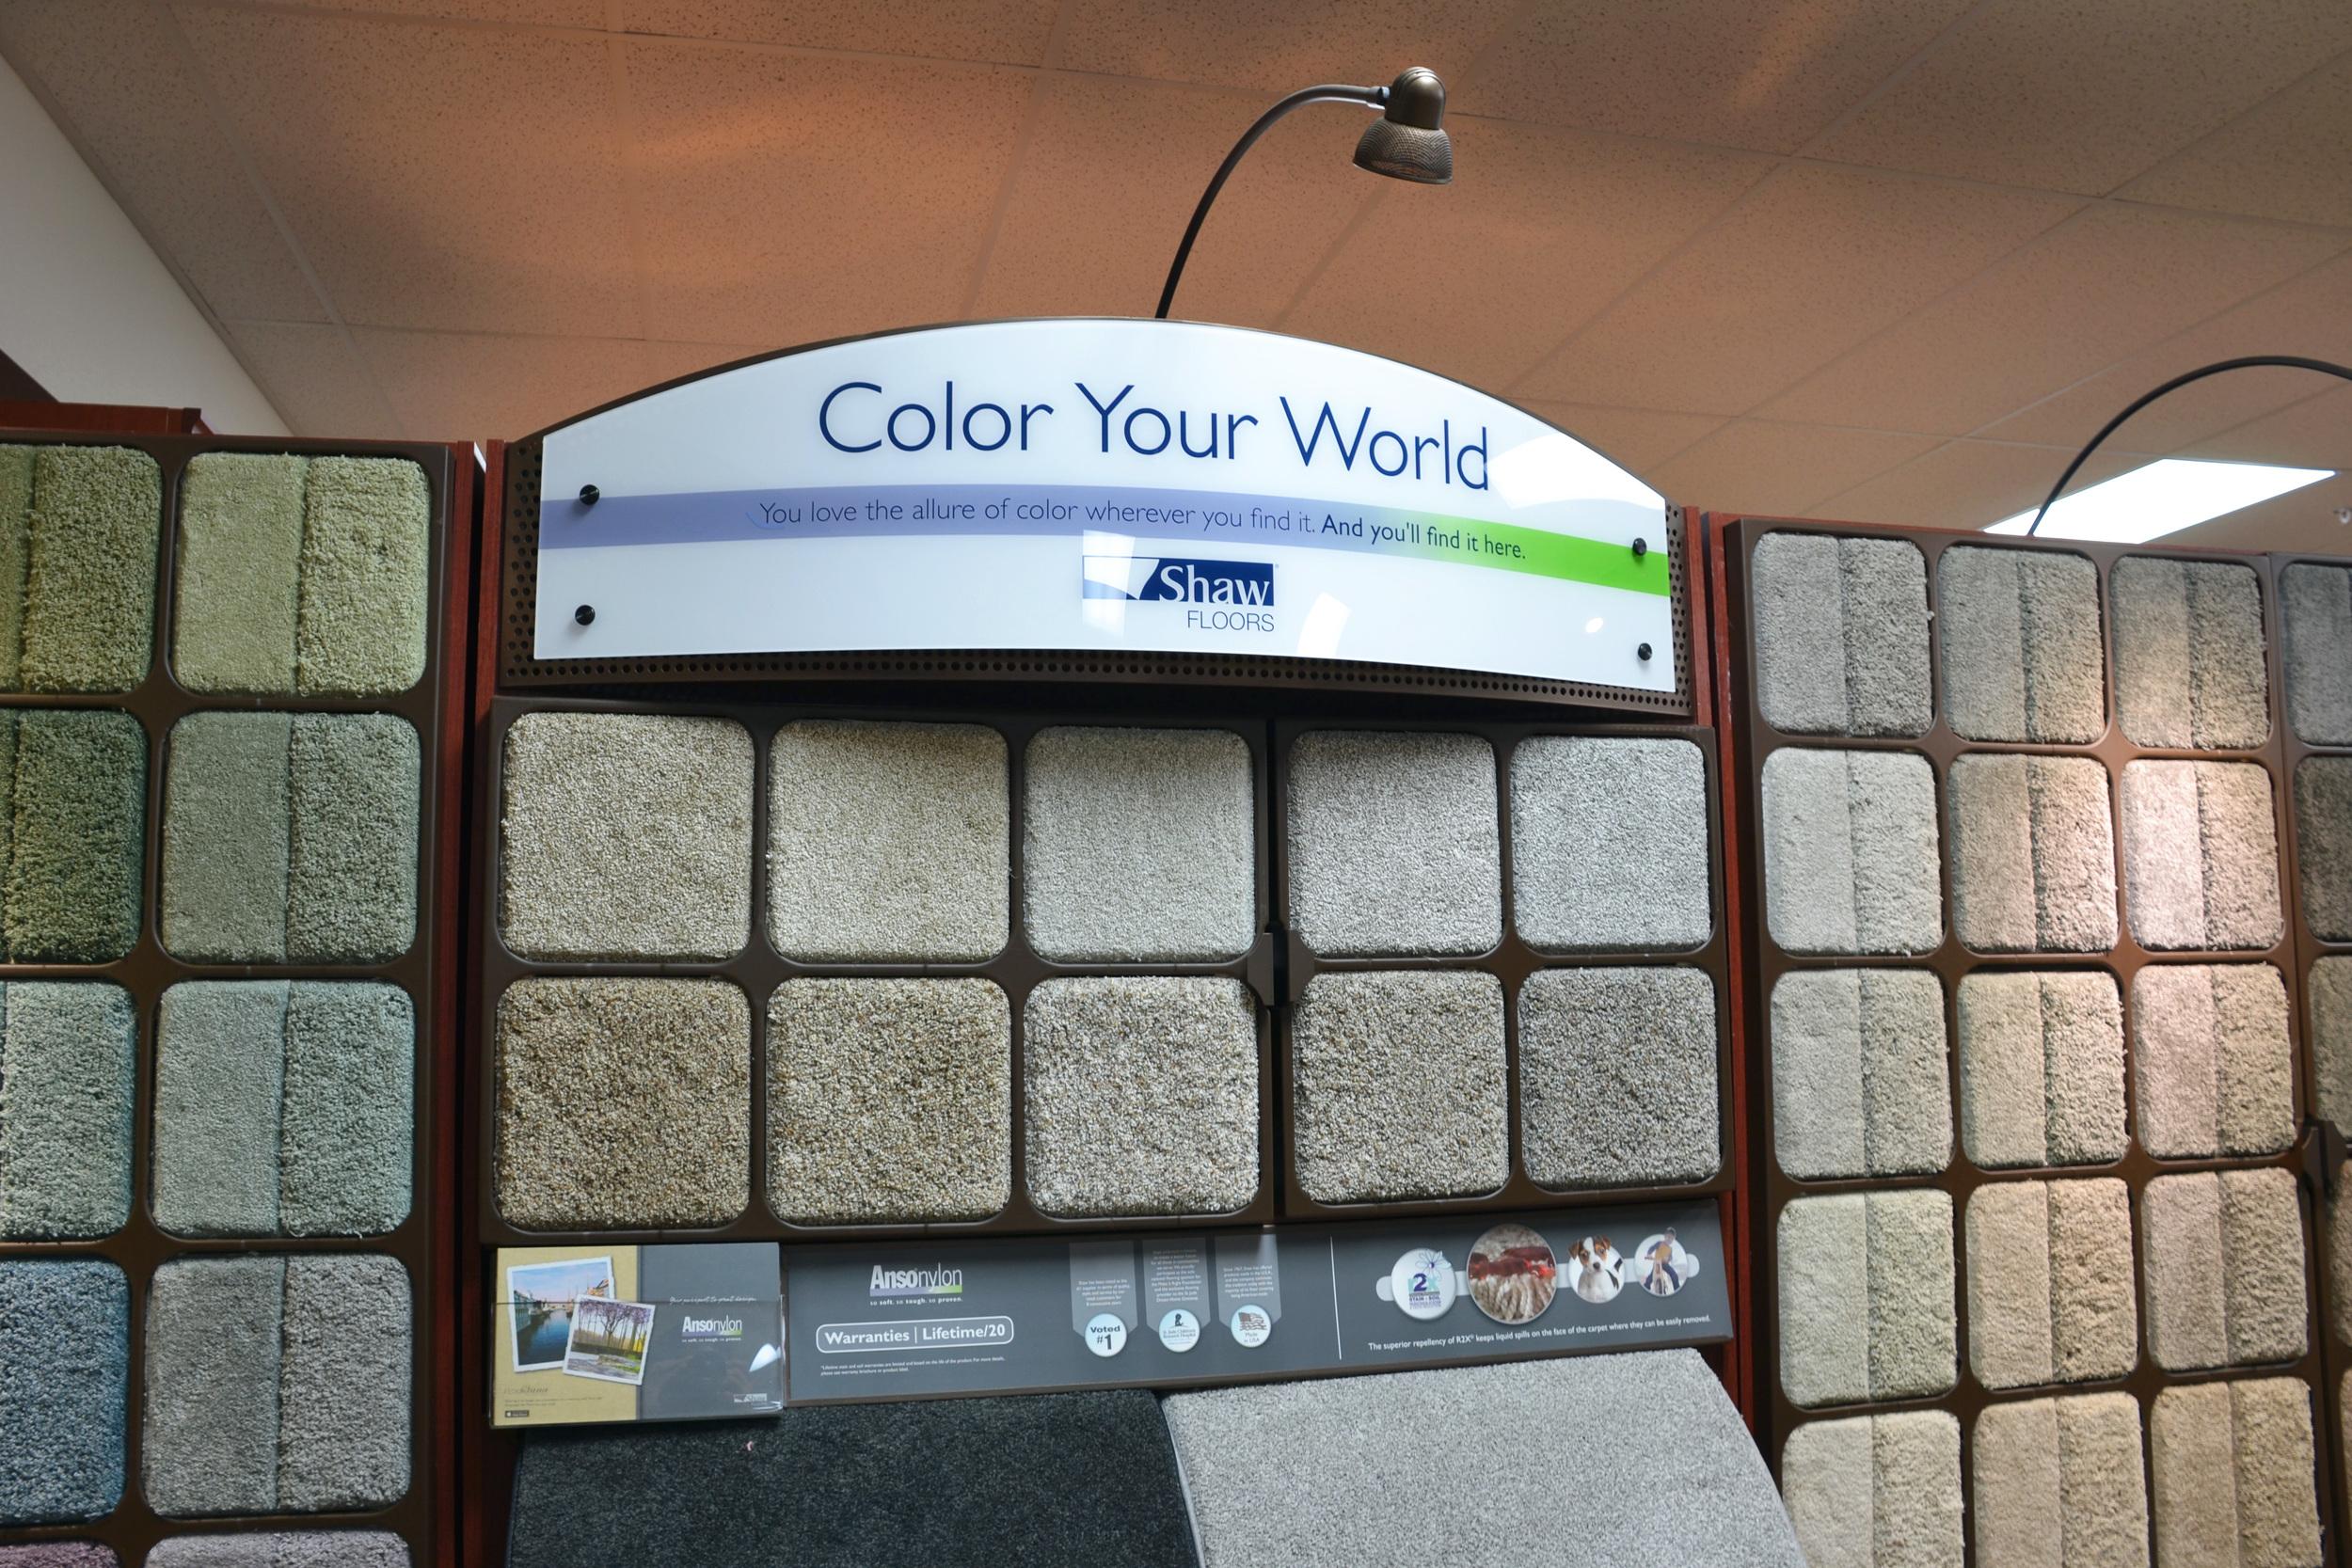 display-shaw-color-world.jpg